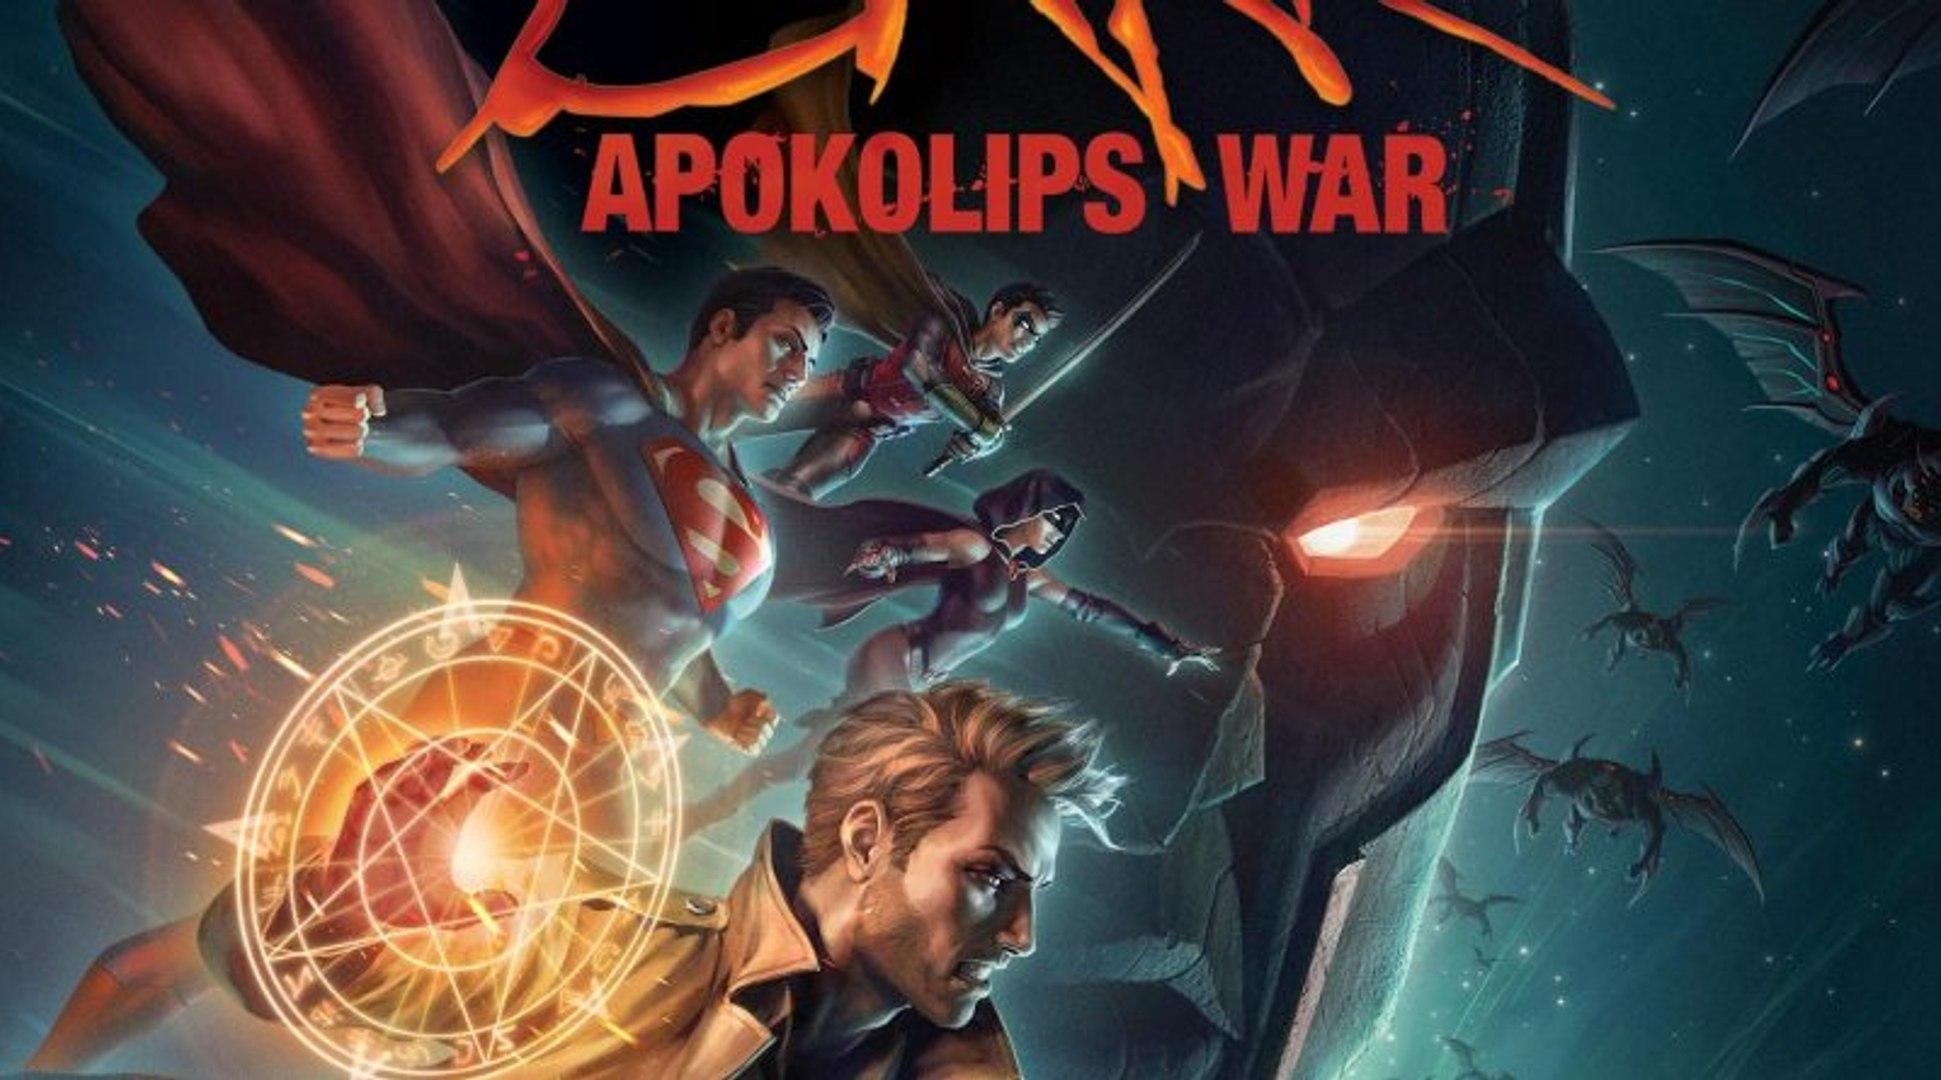 Watch Justice League Dark: Apokolips War free